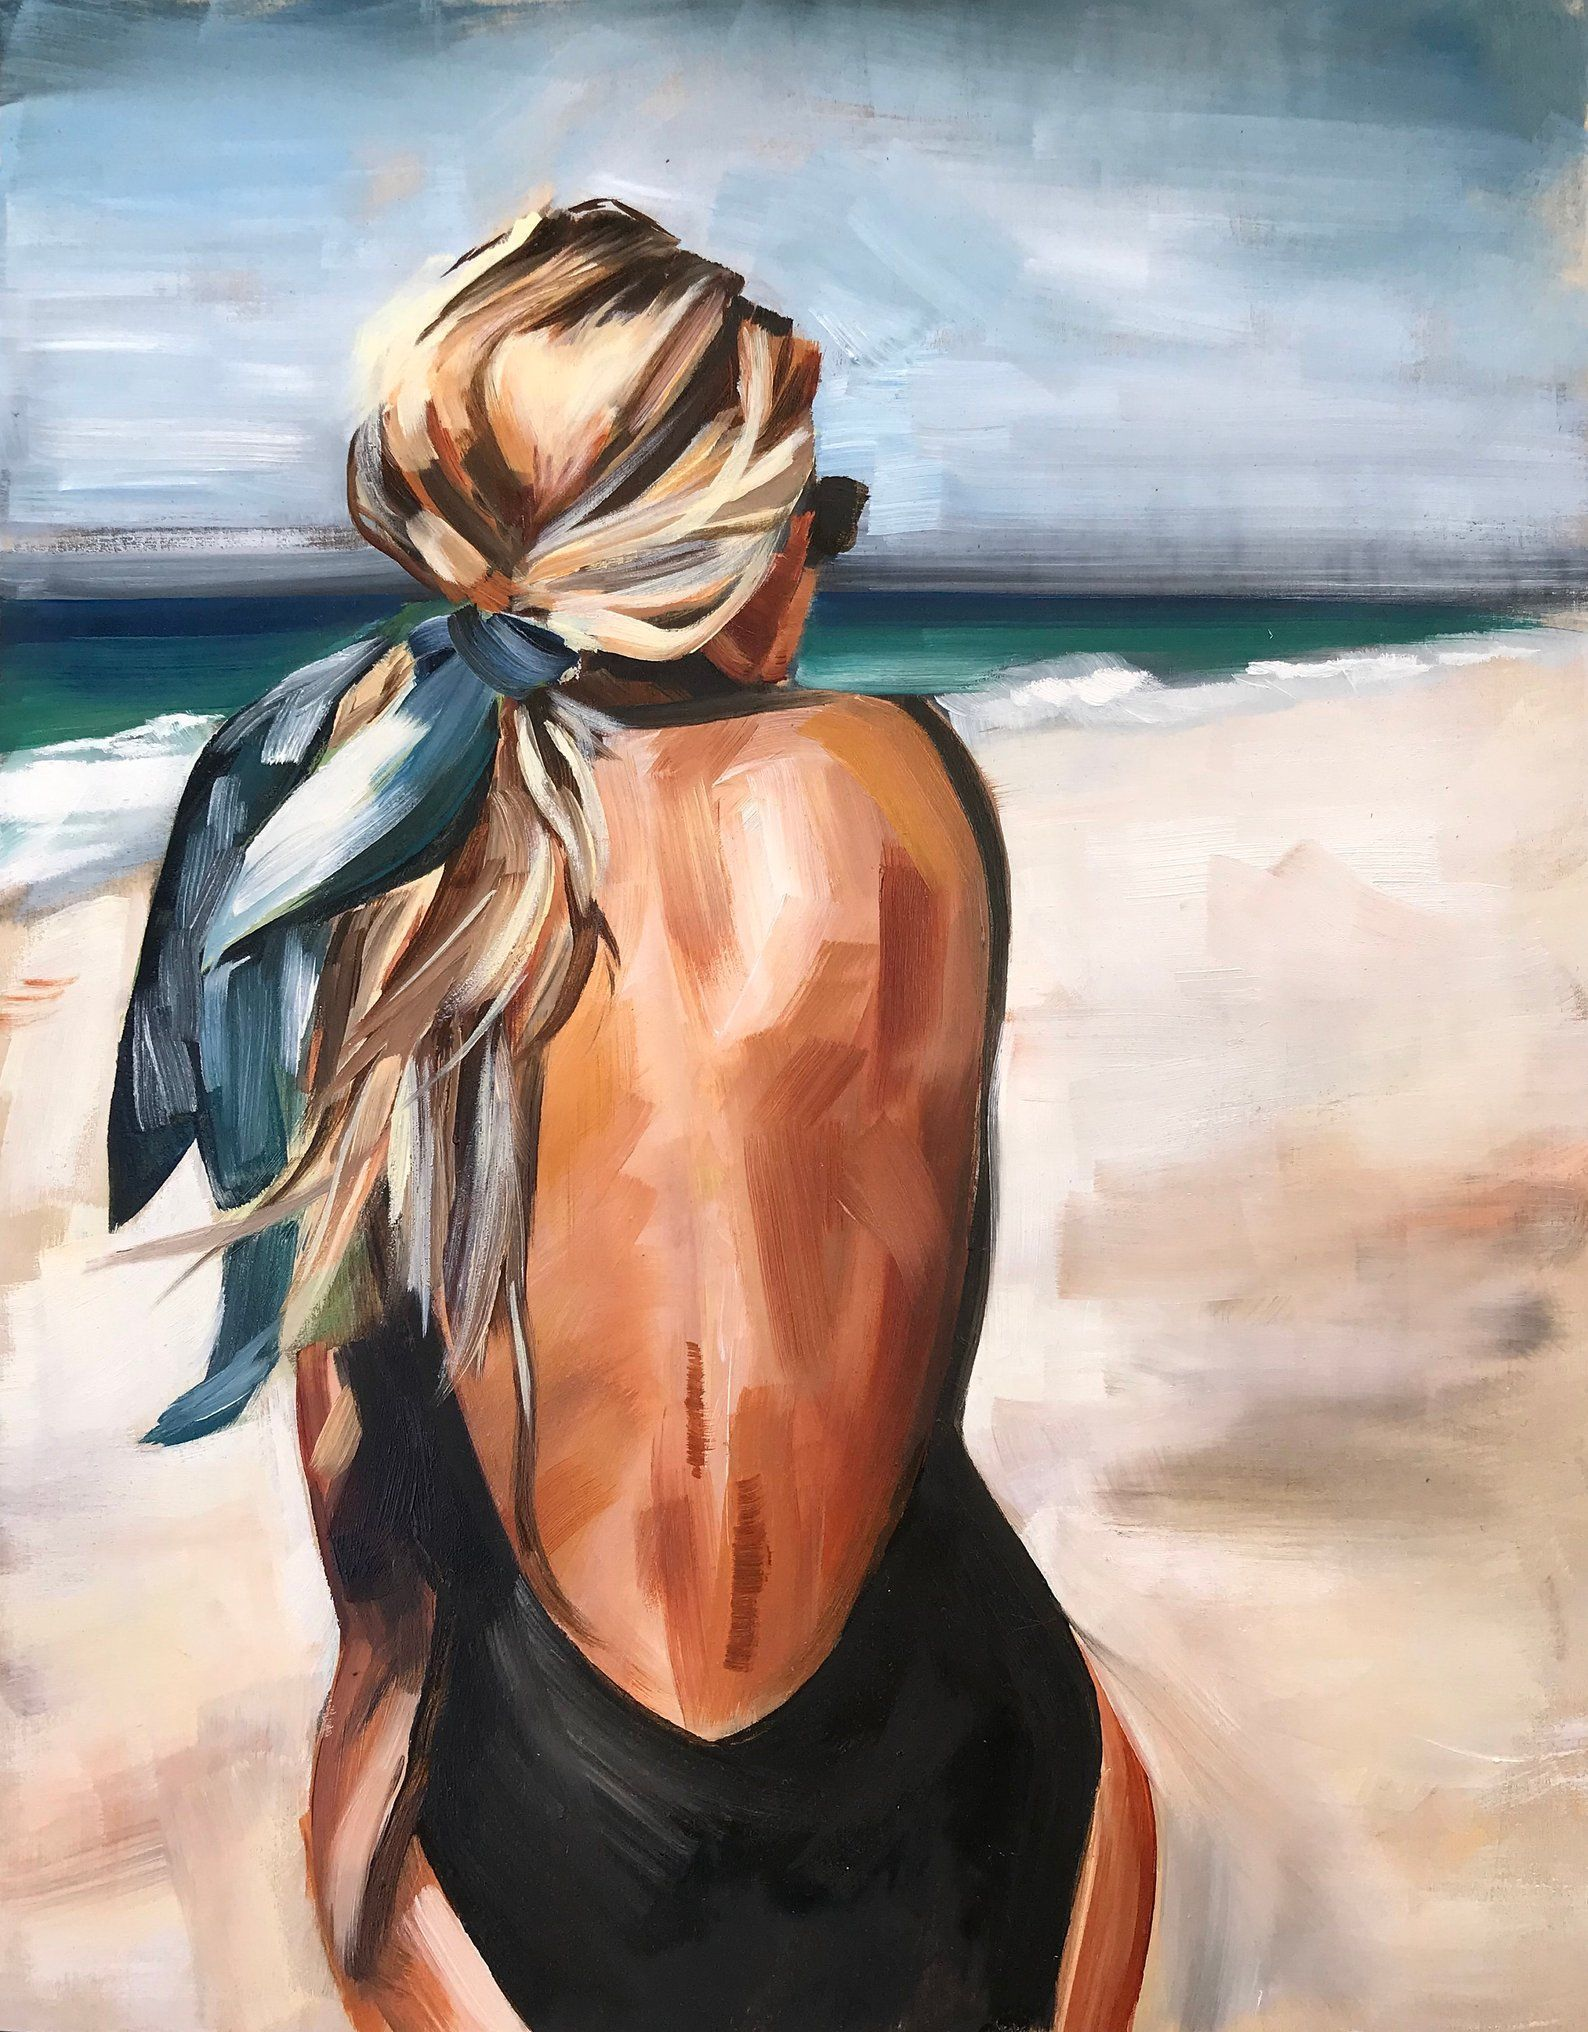 #painting - #painting, #landscapepaintingseasy #Painting La mejor imagen sobre decorate tv wall para tu gusto E - #beachpaint #beautifulpaint #cloudpaint #decorativepaint #moonpaint #paintkitchencabinets #painting #vscopaint